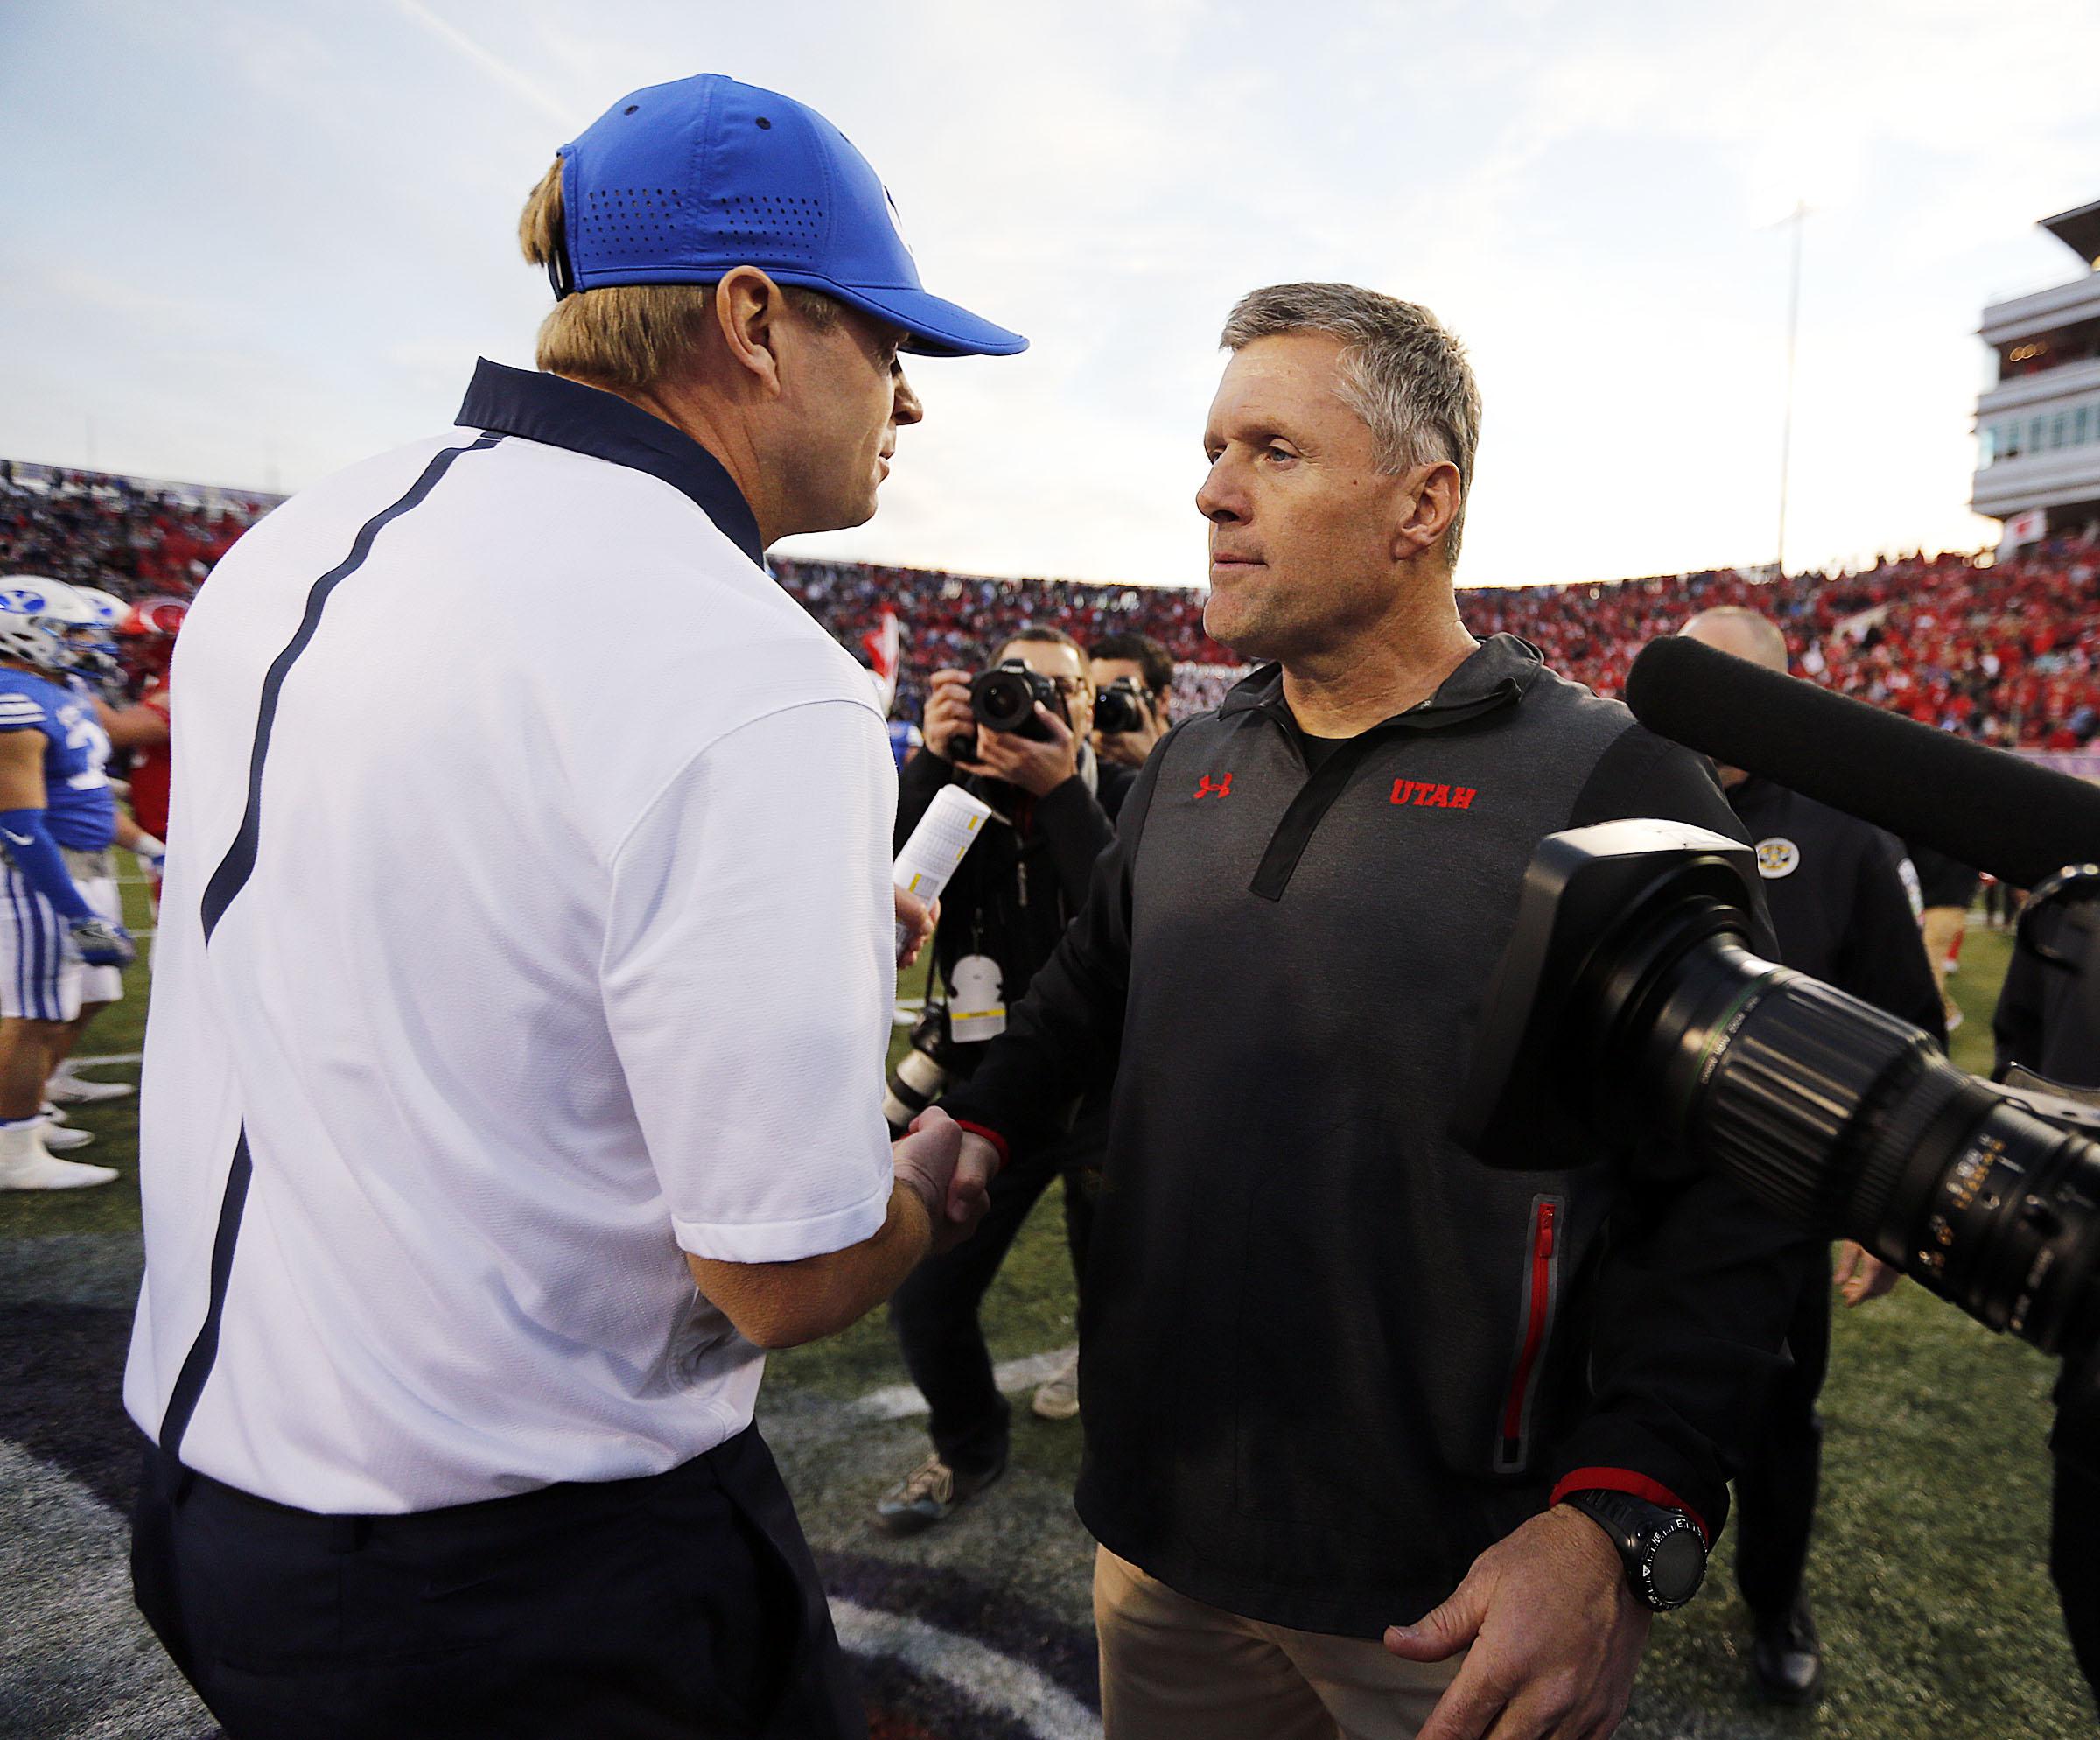 Brigham Young Cougars head coach Bronco Mendenhall, left, and Utah Utes head coach Kyle Whittingham meet following the Royal Purple Las Vegas Bowl.